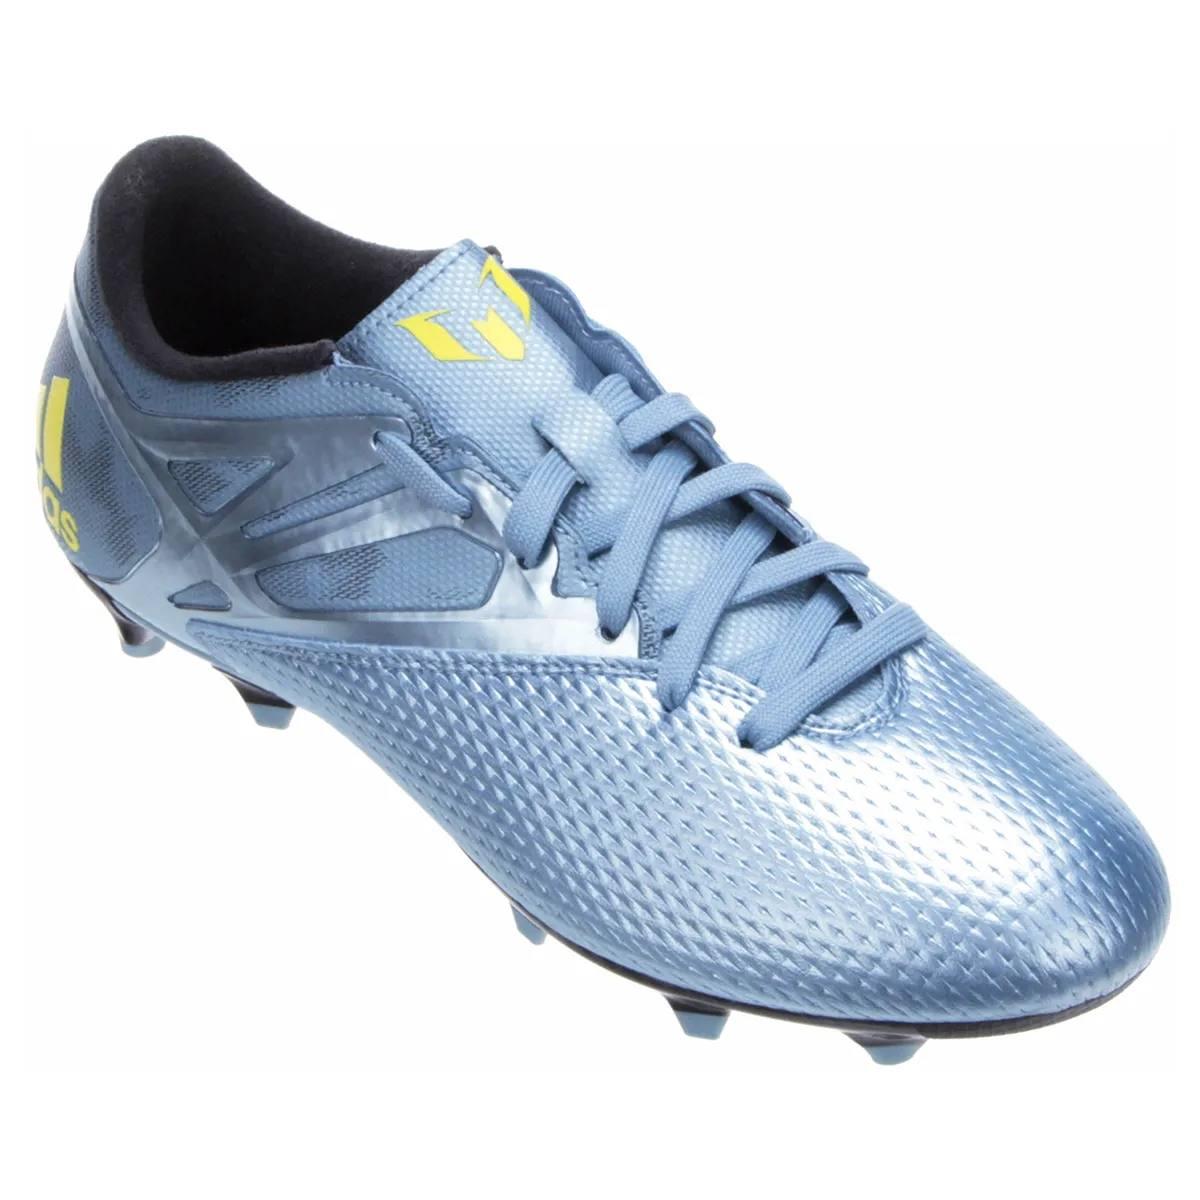 Chuteira Campo Adidas Messi 15.3 FG